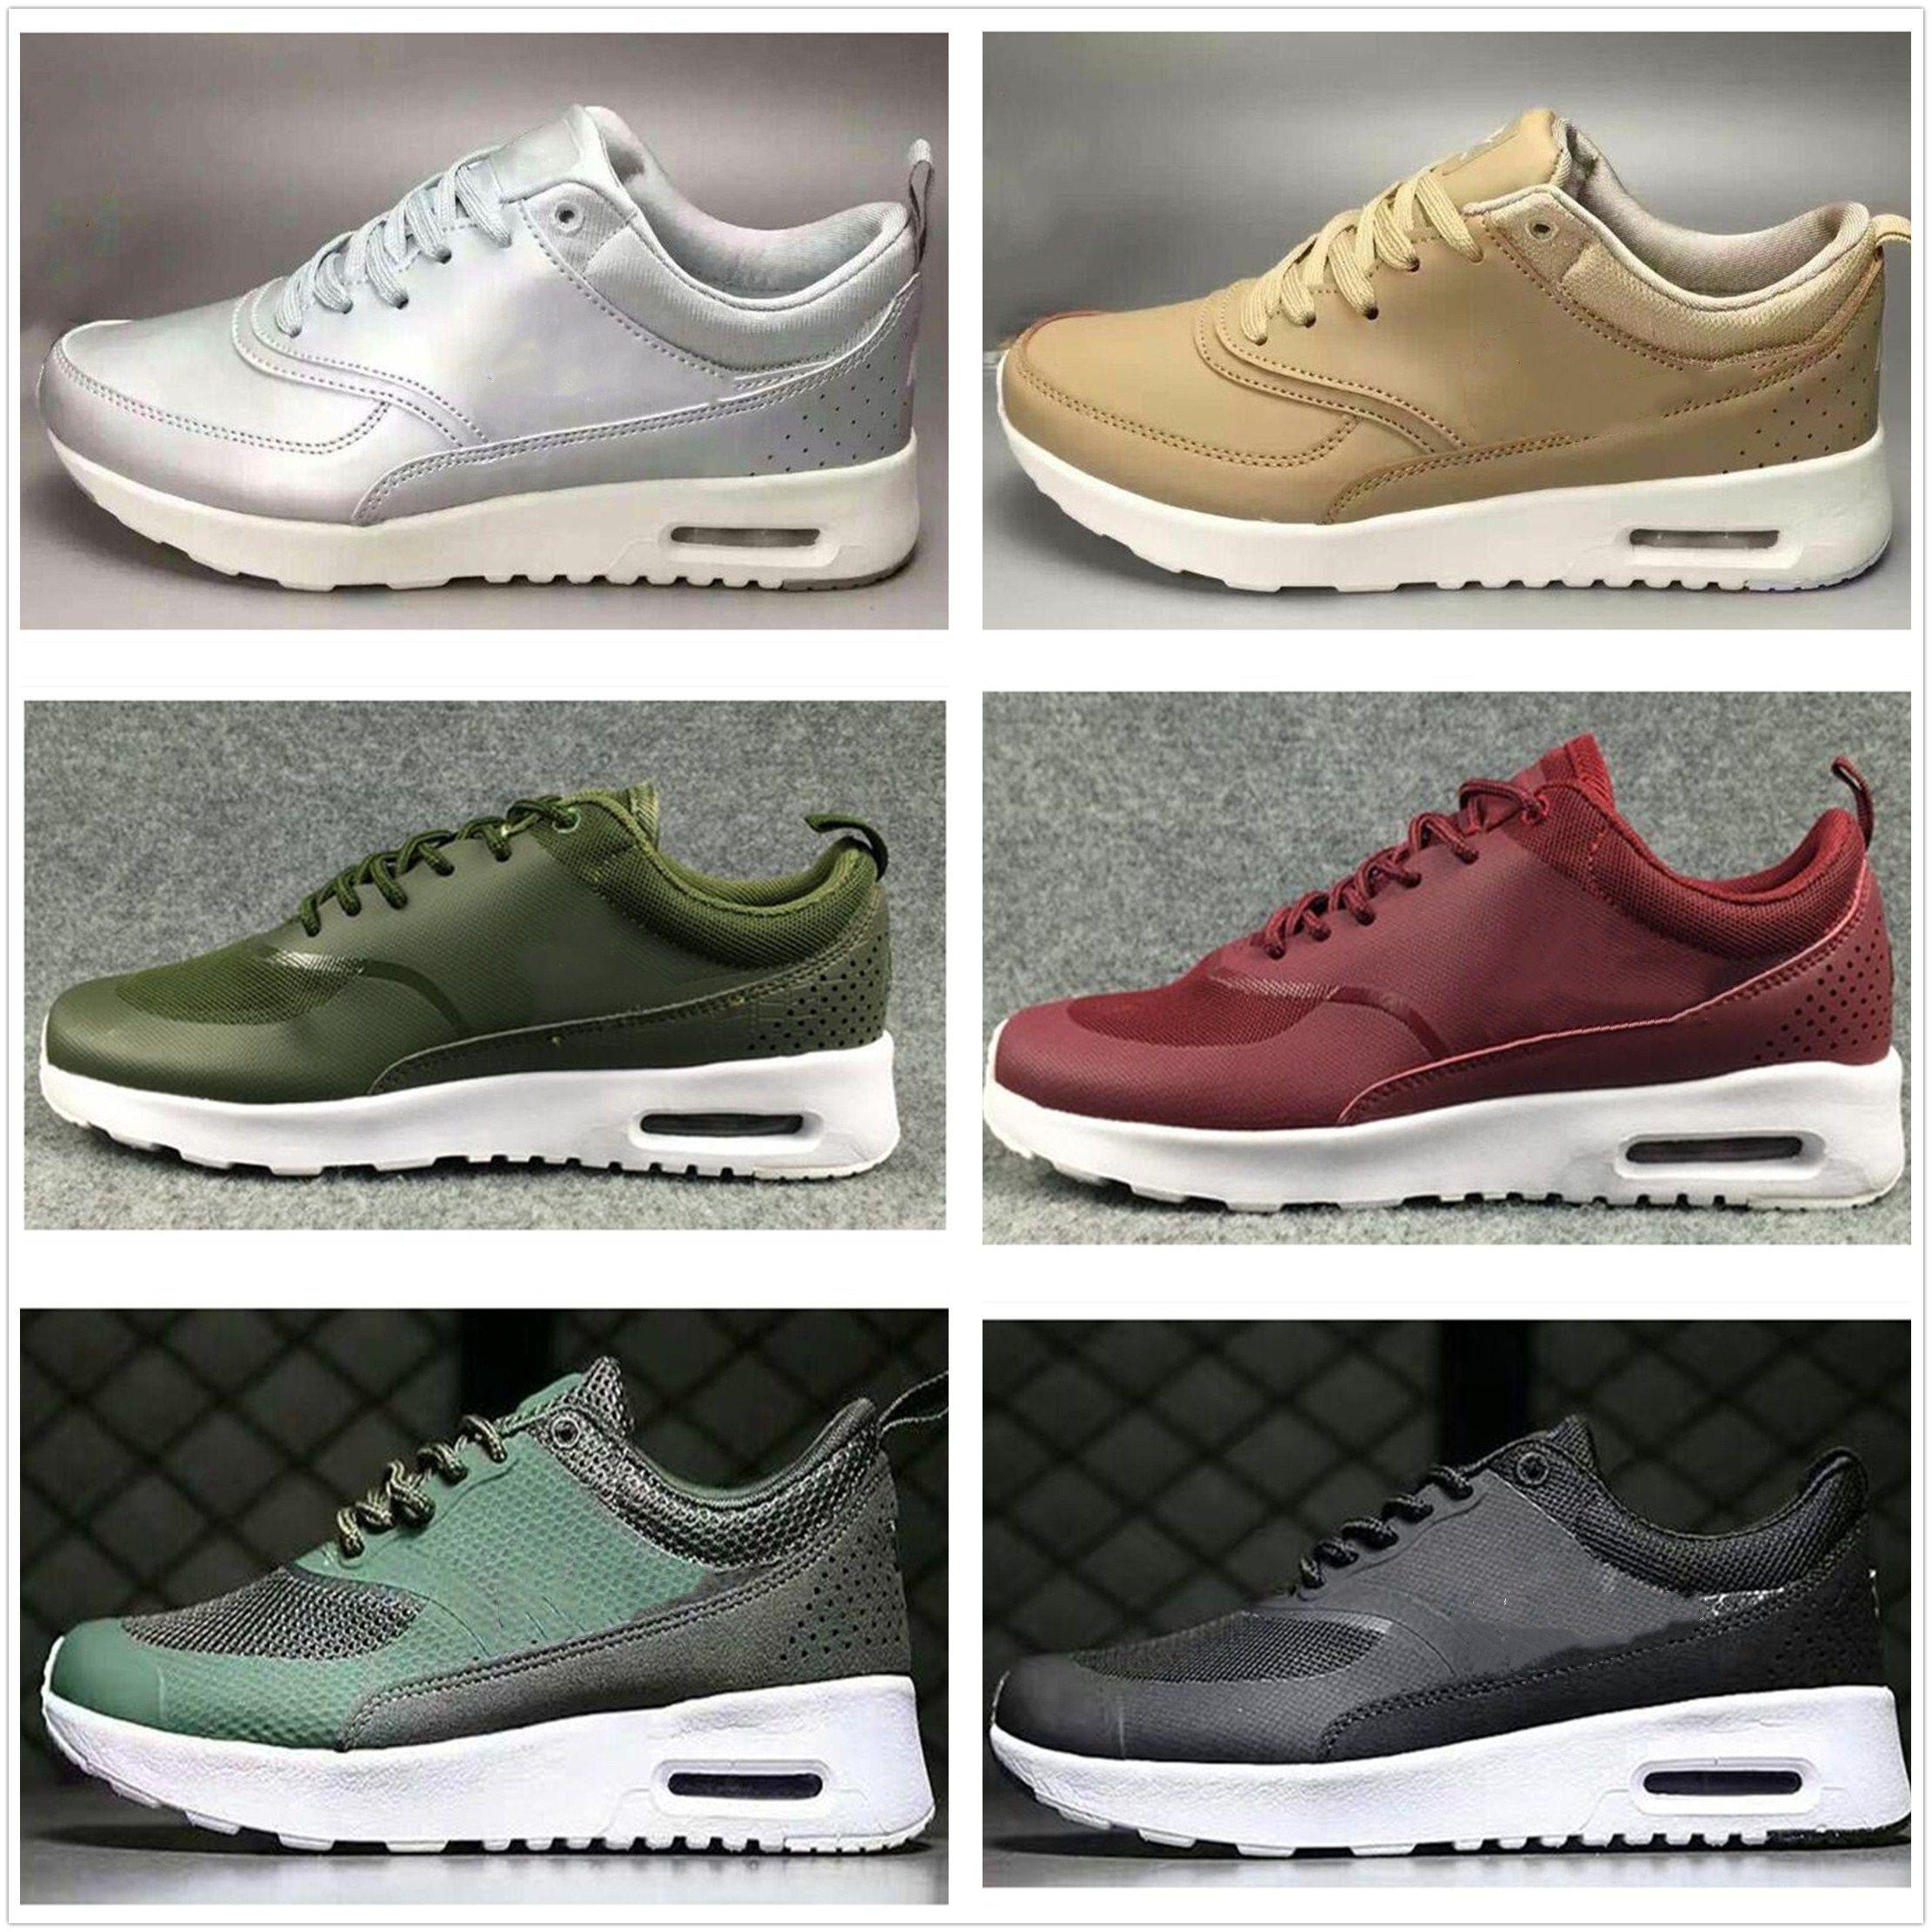 best service 023b0 38a68 Compre Nike Air Max Airmax 87 Classic Men Women 87 Zapatillas De Deporte De  Diseño 2018 Zapatillas De Deporte Thea De Cuero Para Hombre Huaraches Tenis  ...